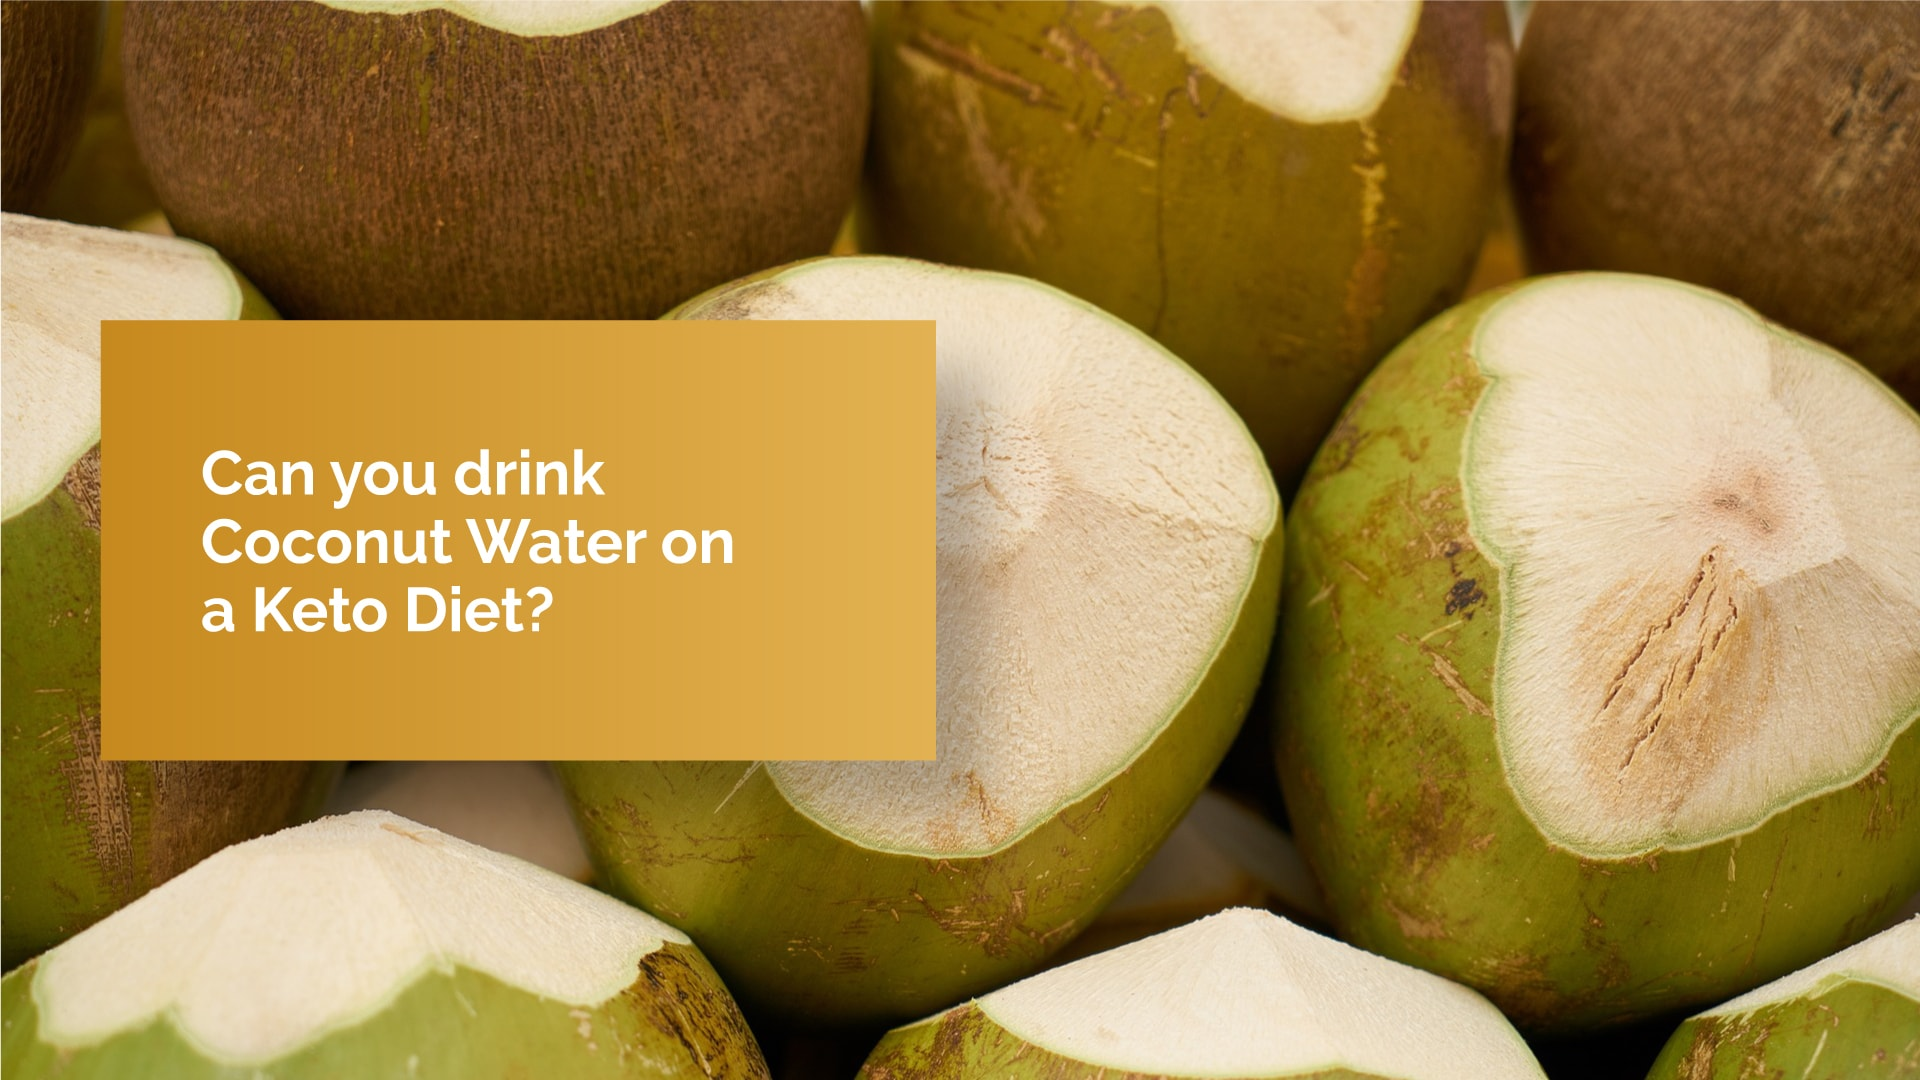 coconut water keto diet